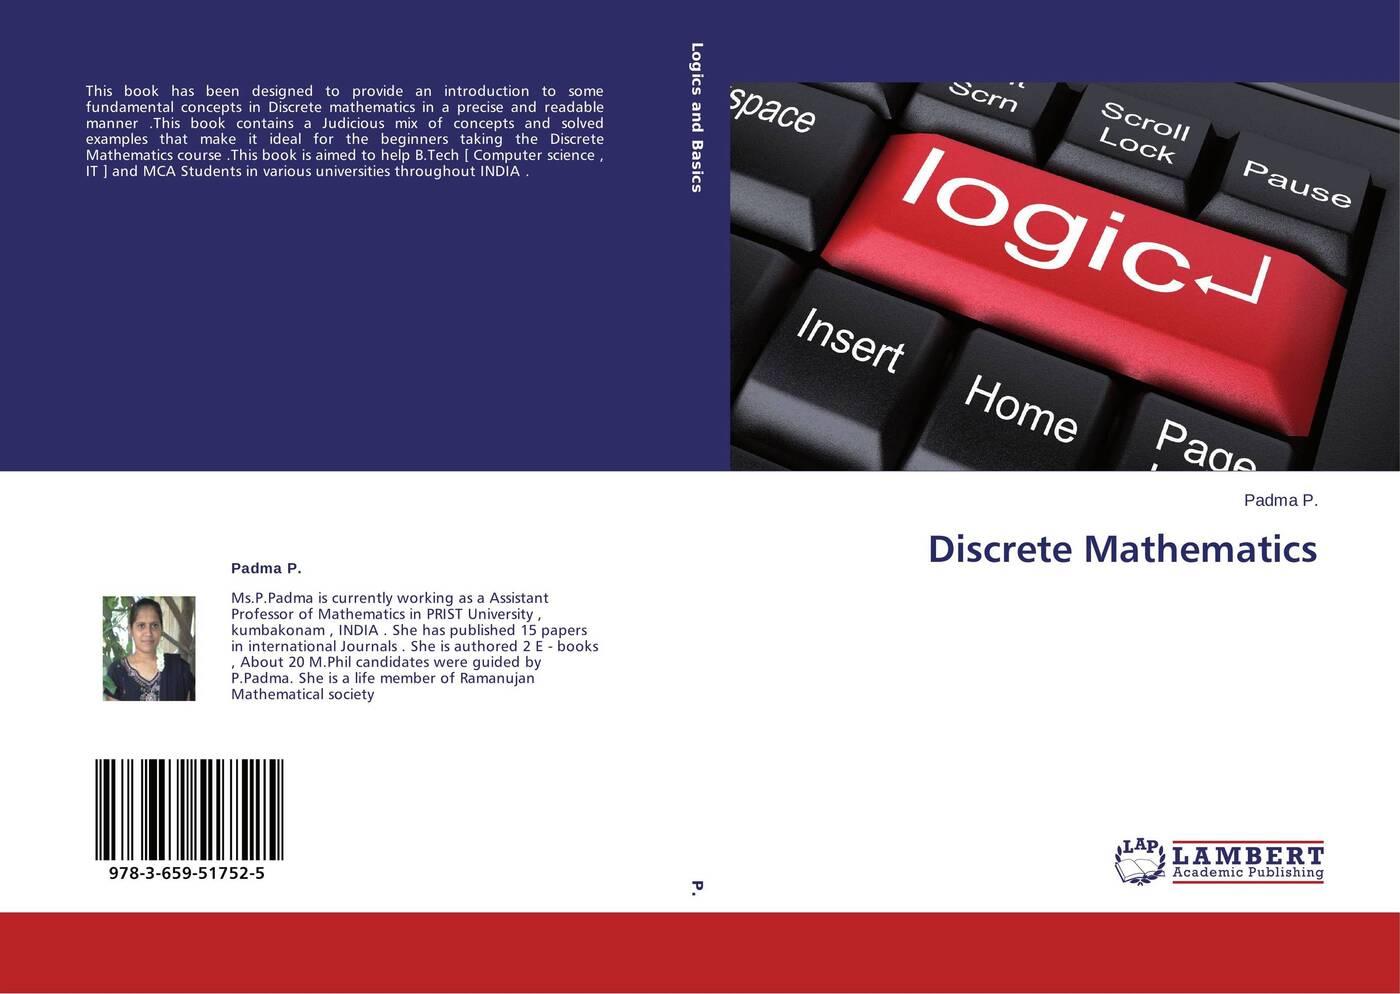 Padma P. Discrete Mathematics charalambos charalambides a discrete q distributions